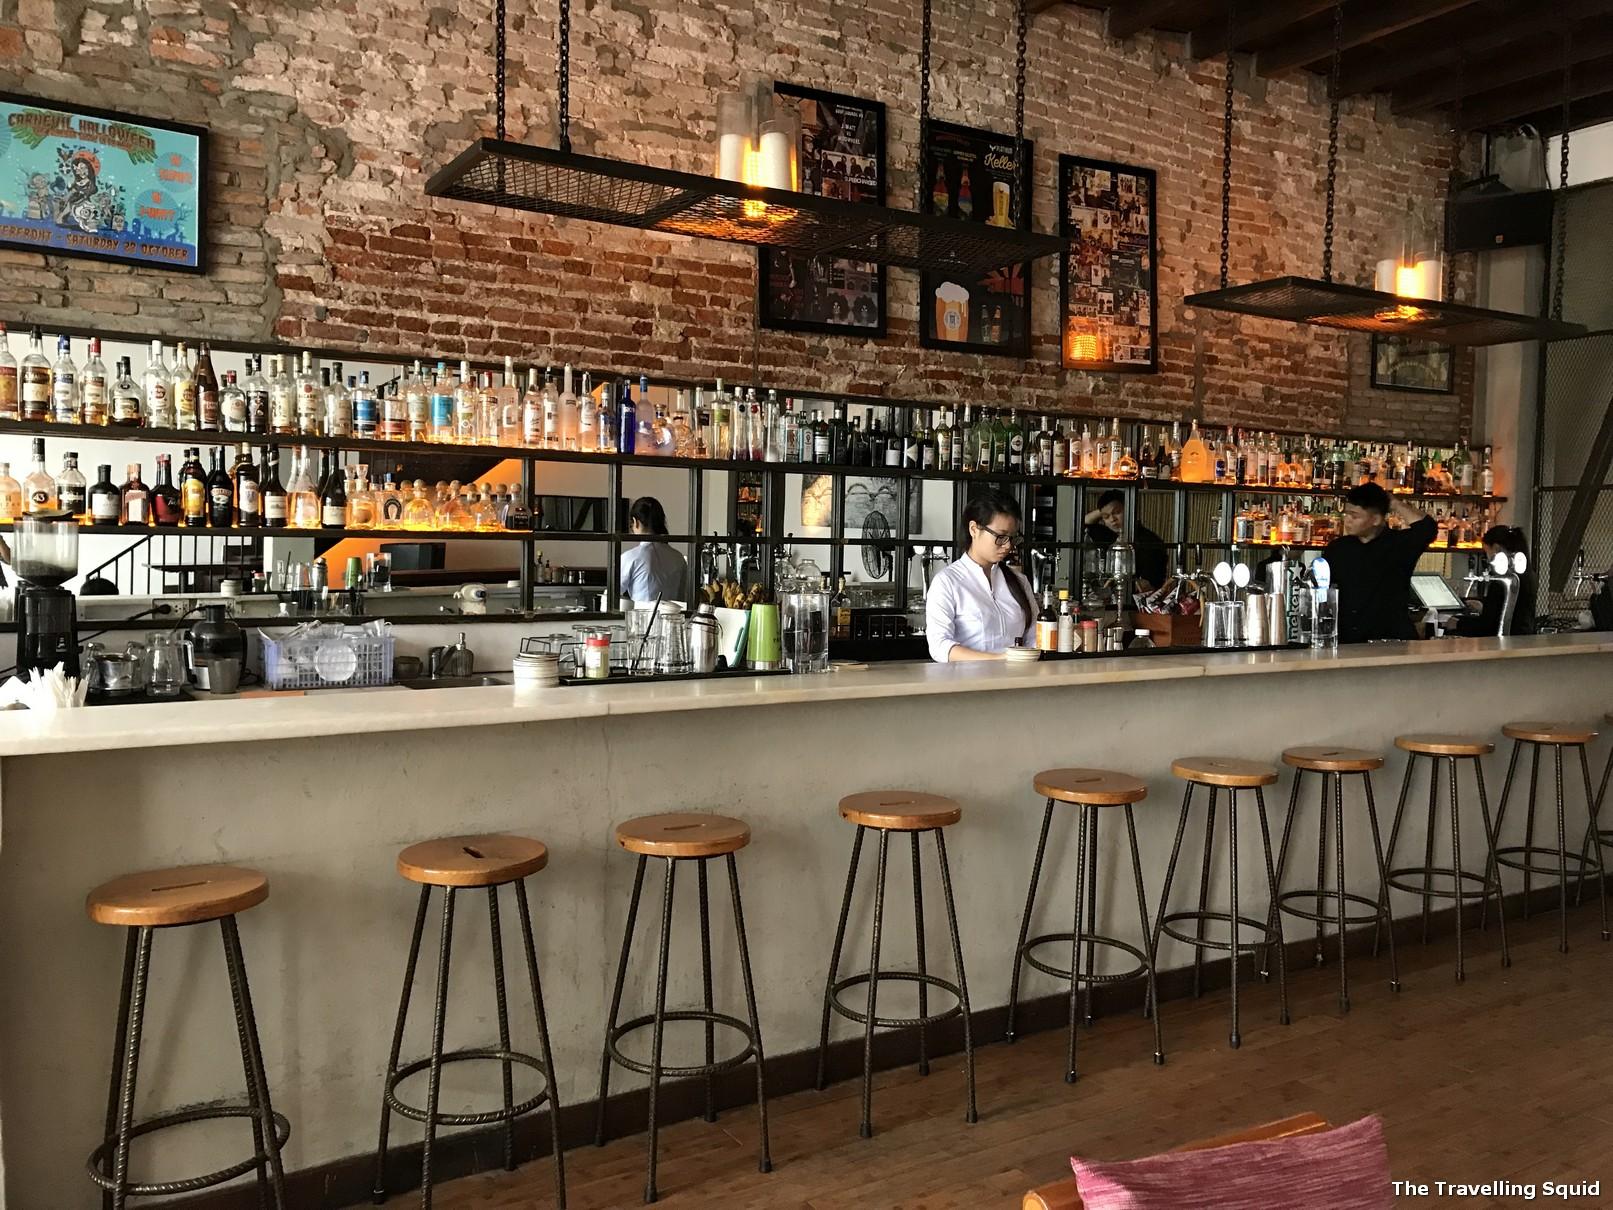 Waterfront Restaurant and Bar in Danang for good Vietnamese beer